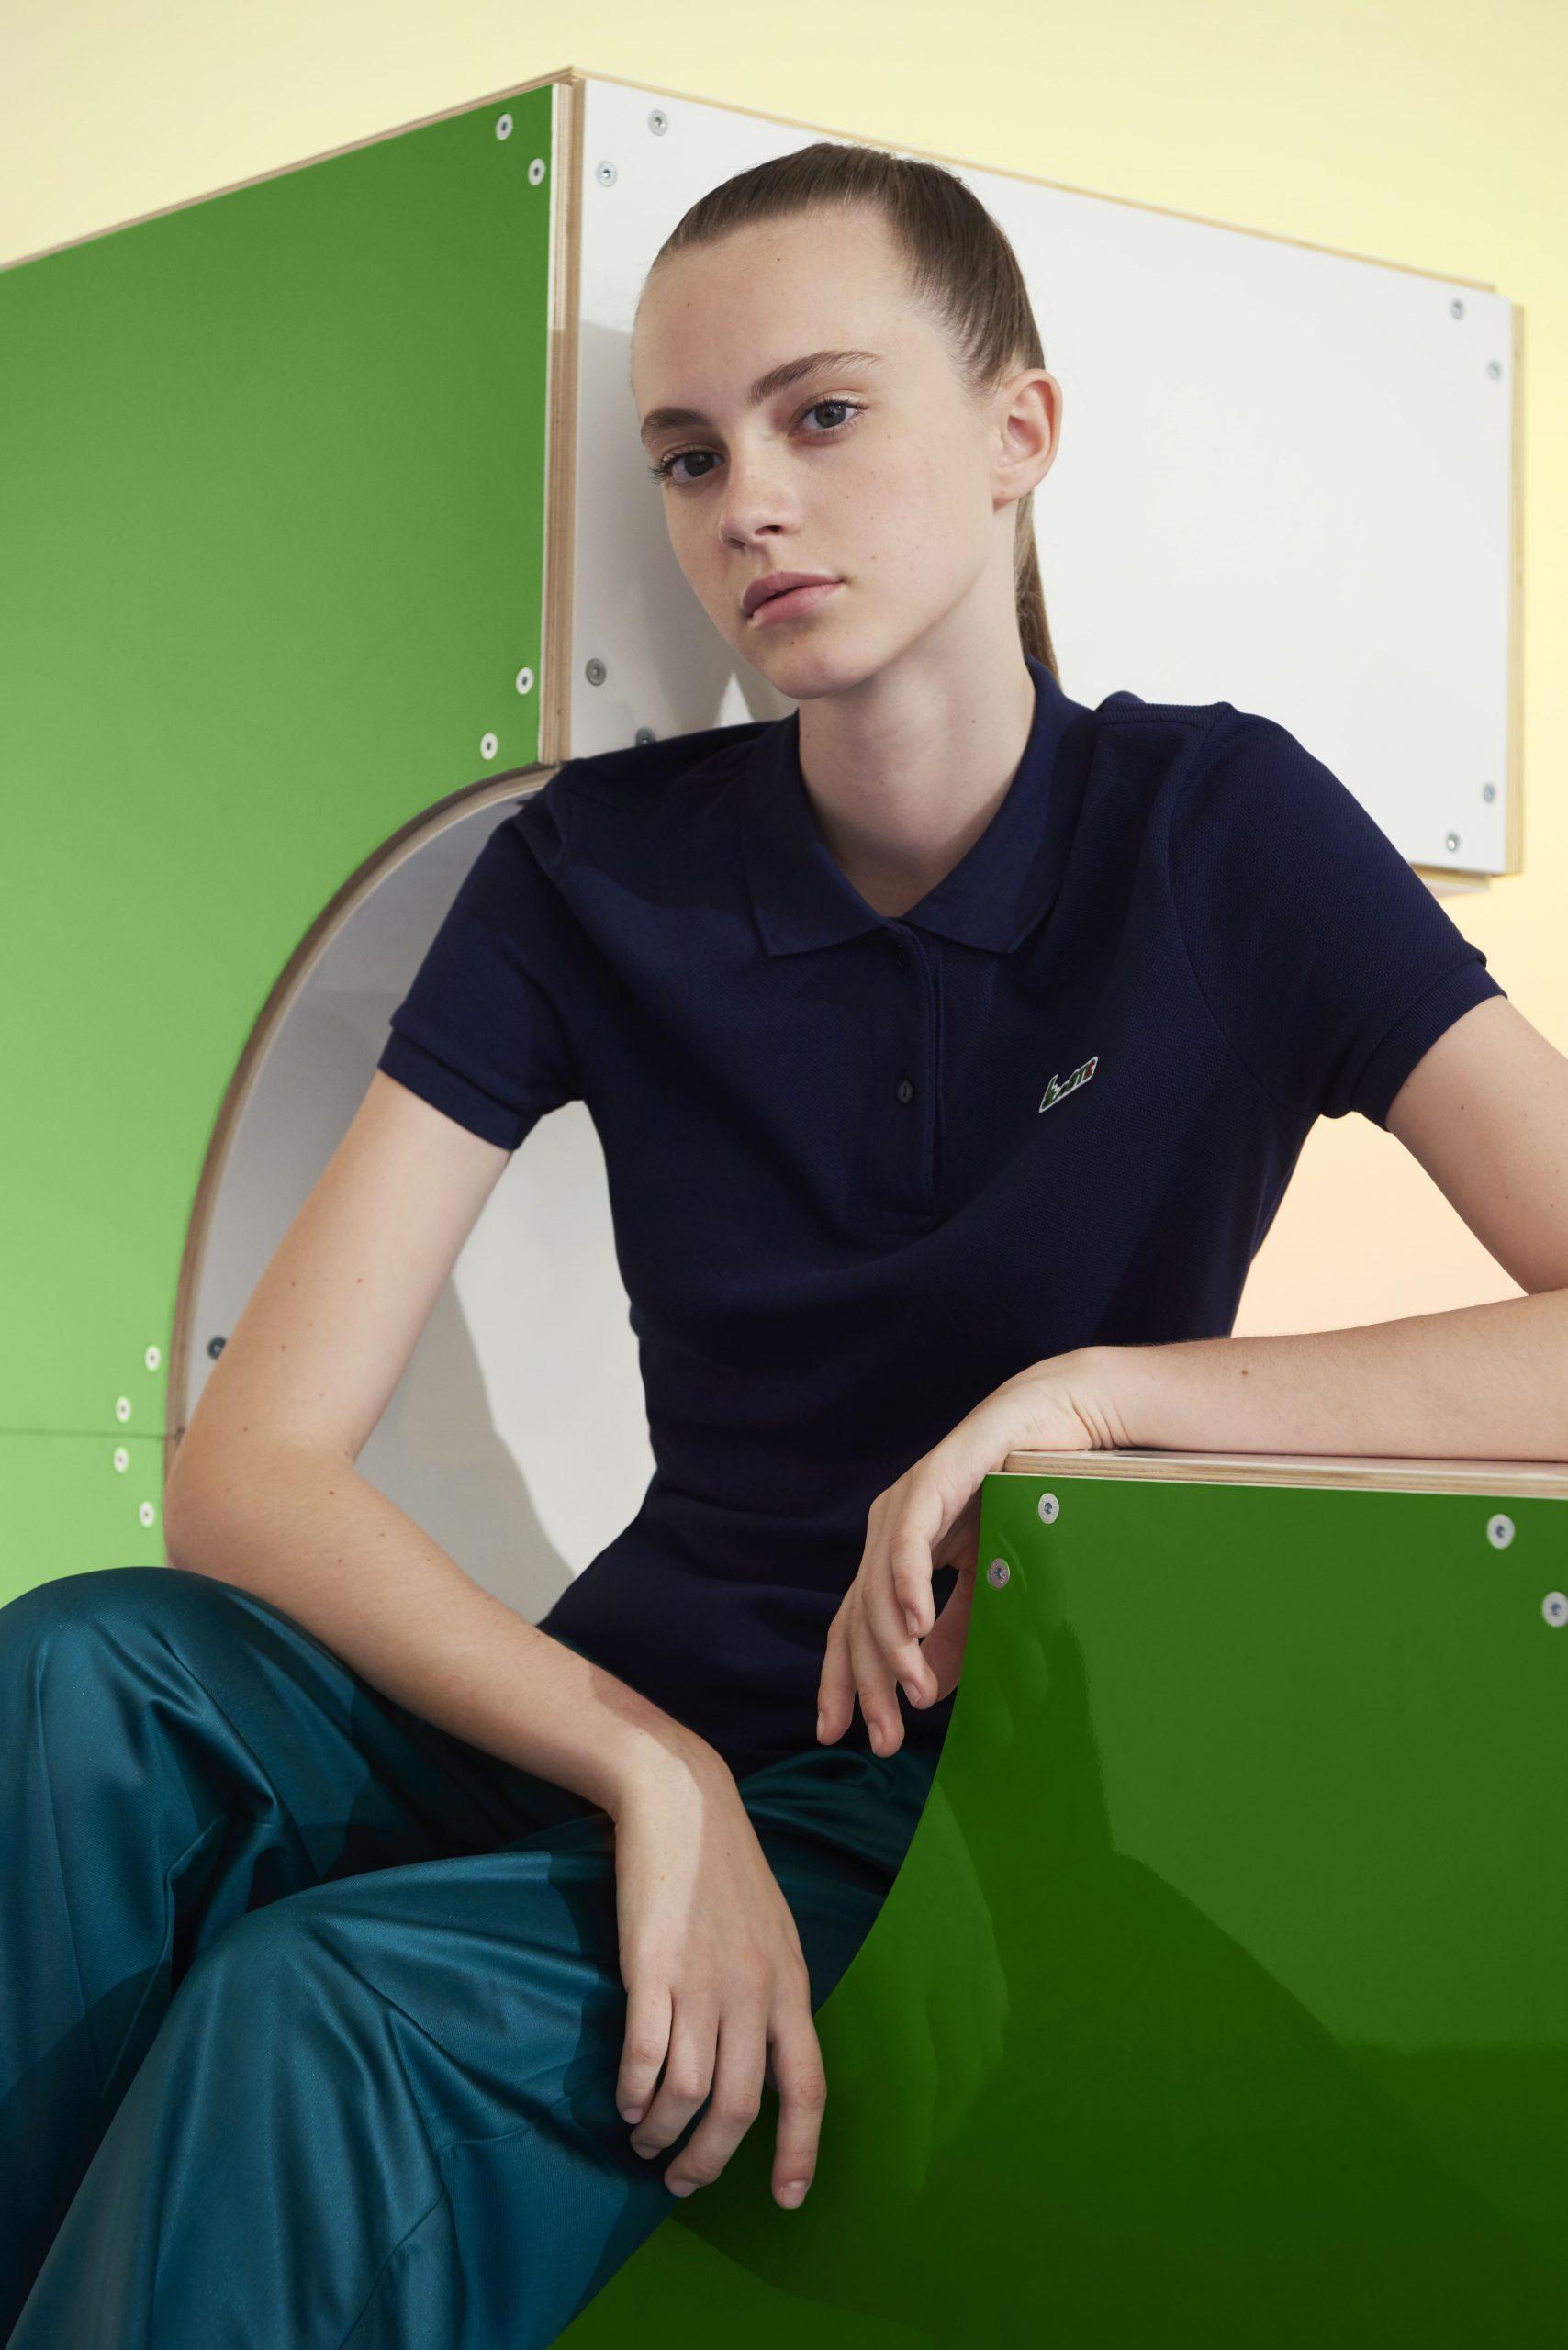 324db5a3963 Lacoste X MM (Paris) FW17 Vanity Teen Menswear Magazine (10 ...